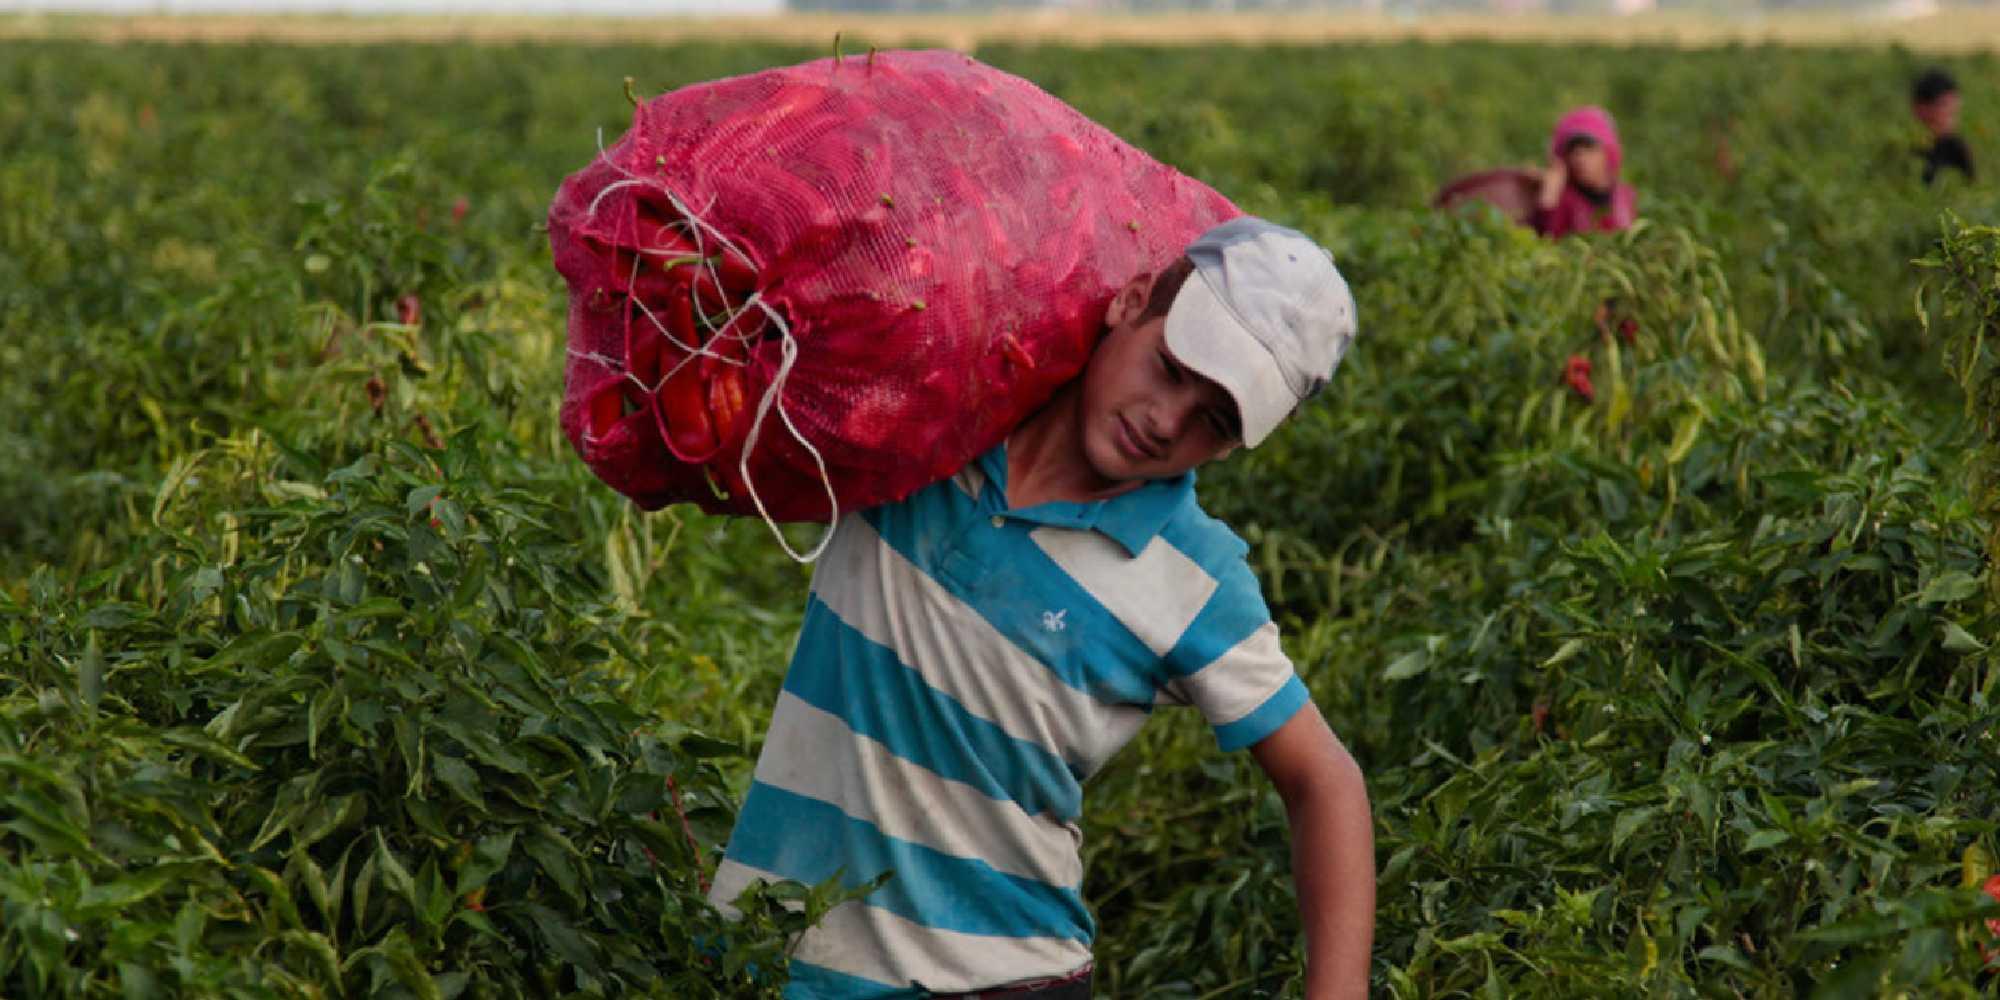 trabajo infantil méxico | business insider mexico